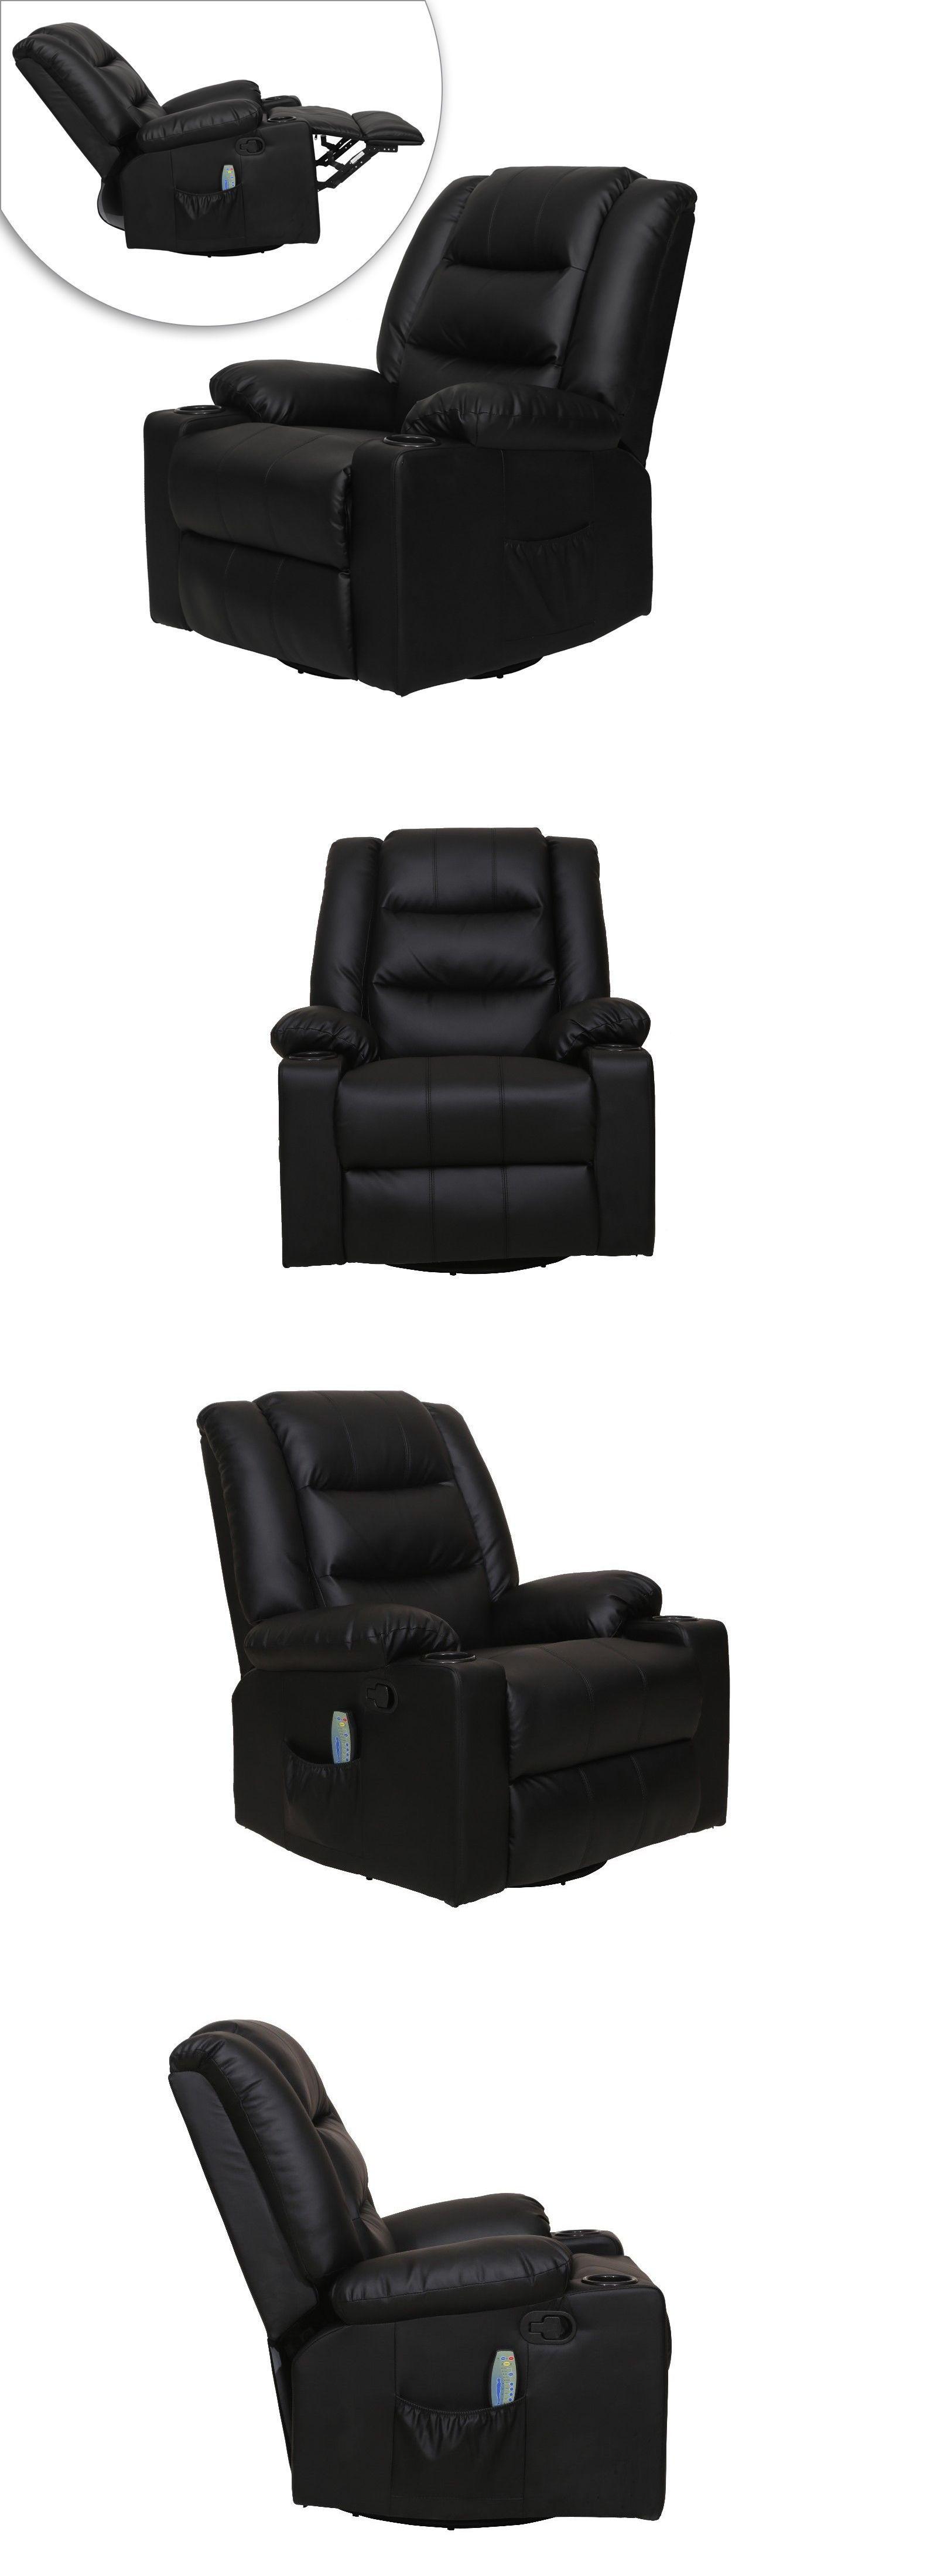 Electric Massage Chairs Electric Massage Sofa Chair Ergonomic